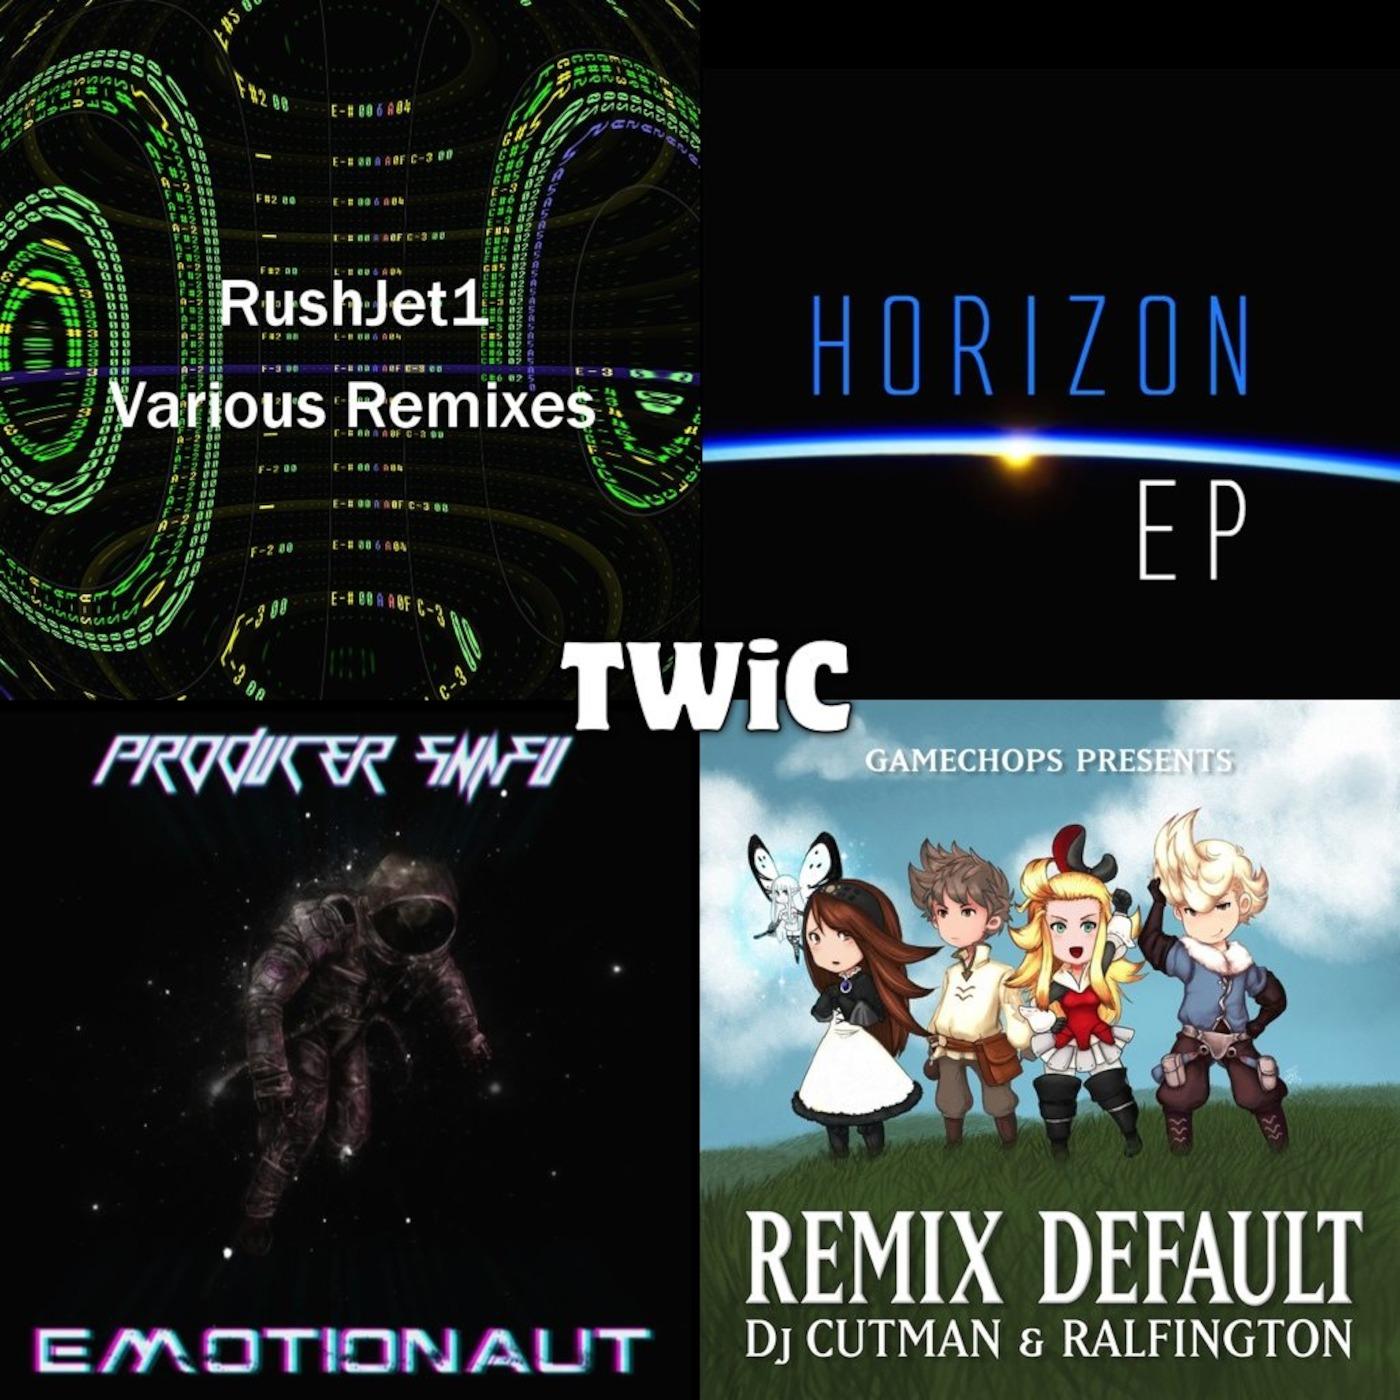 TWiC 059: Rushjet1, Dj CUTMAN & Ralfington, PICE, Producer Snafu